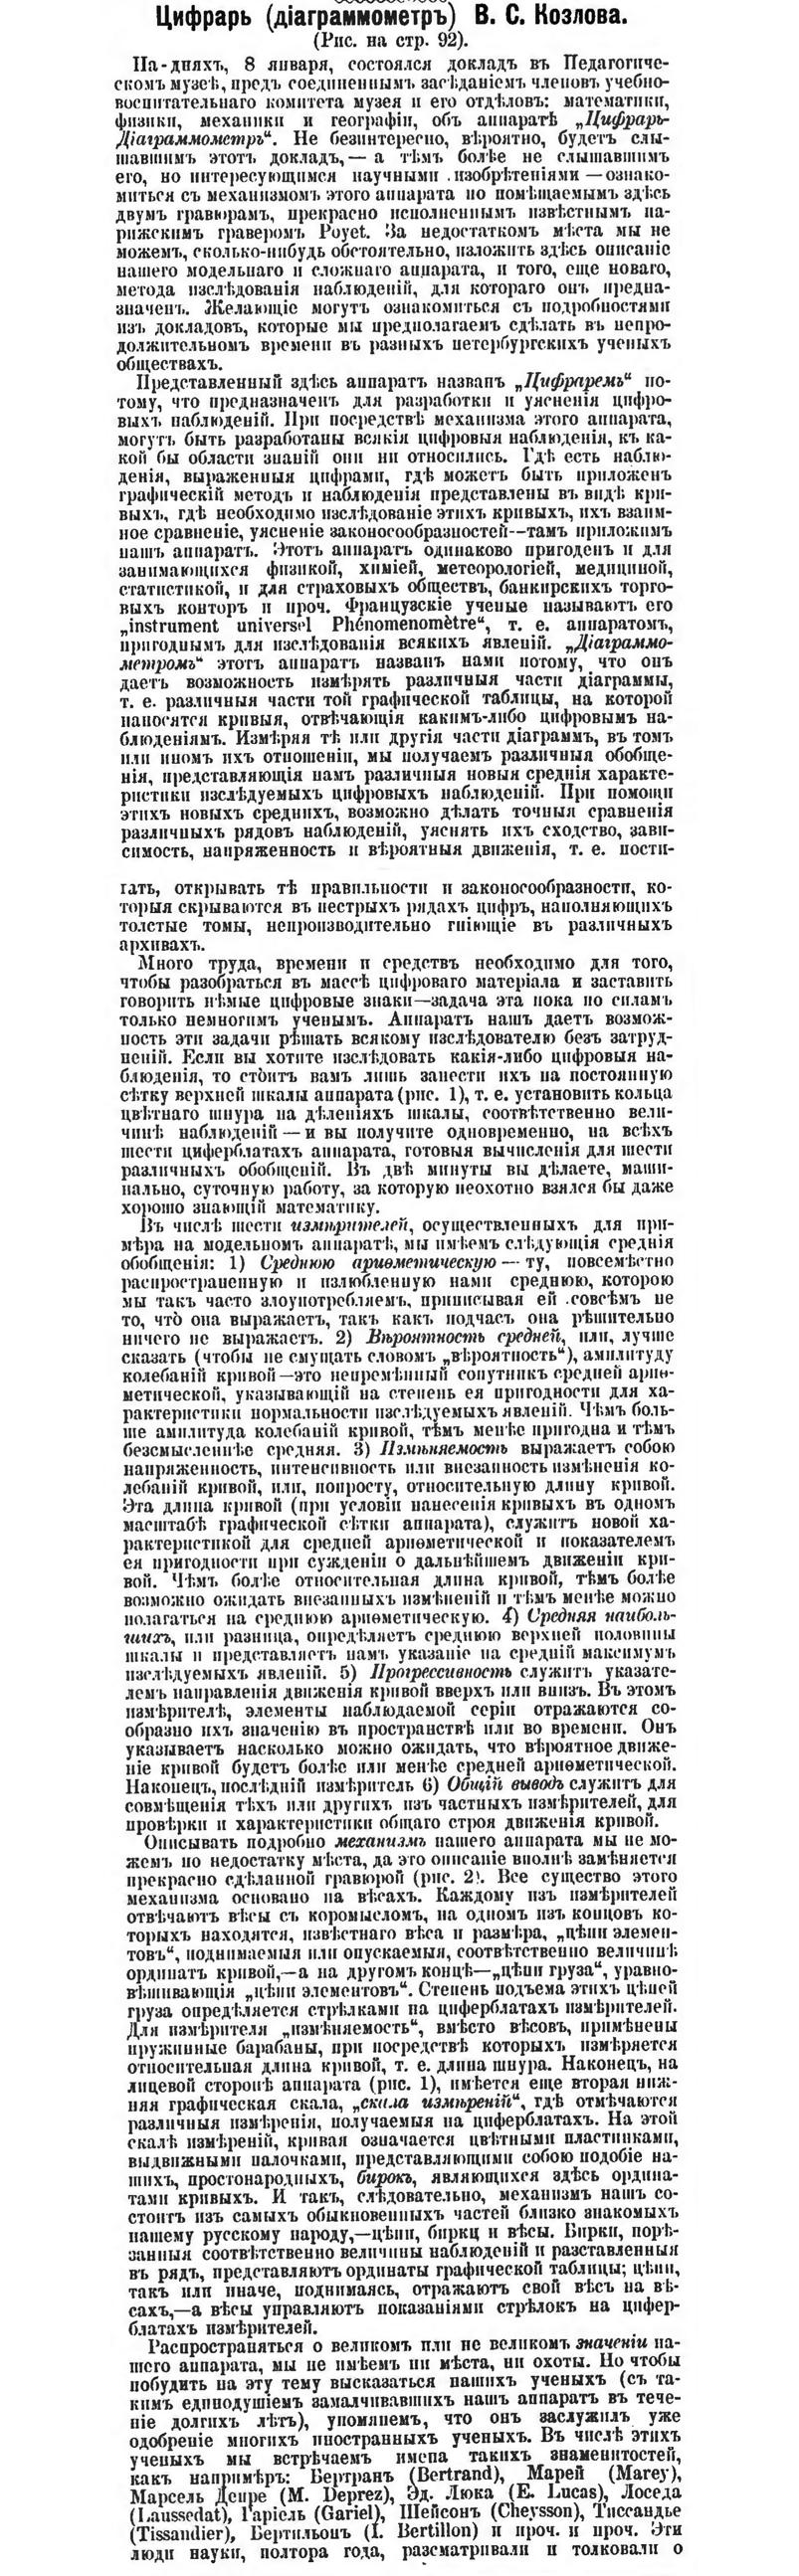 Цифрарь-диаграммометр образца 1890 г - 7